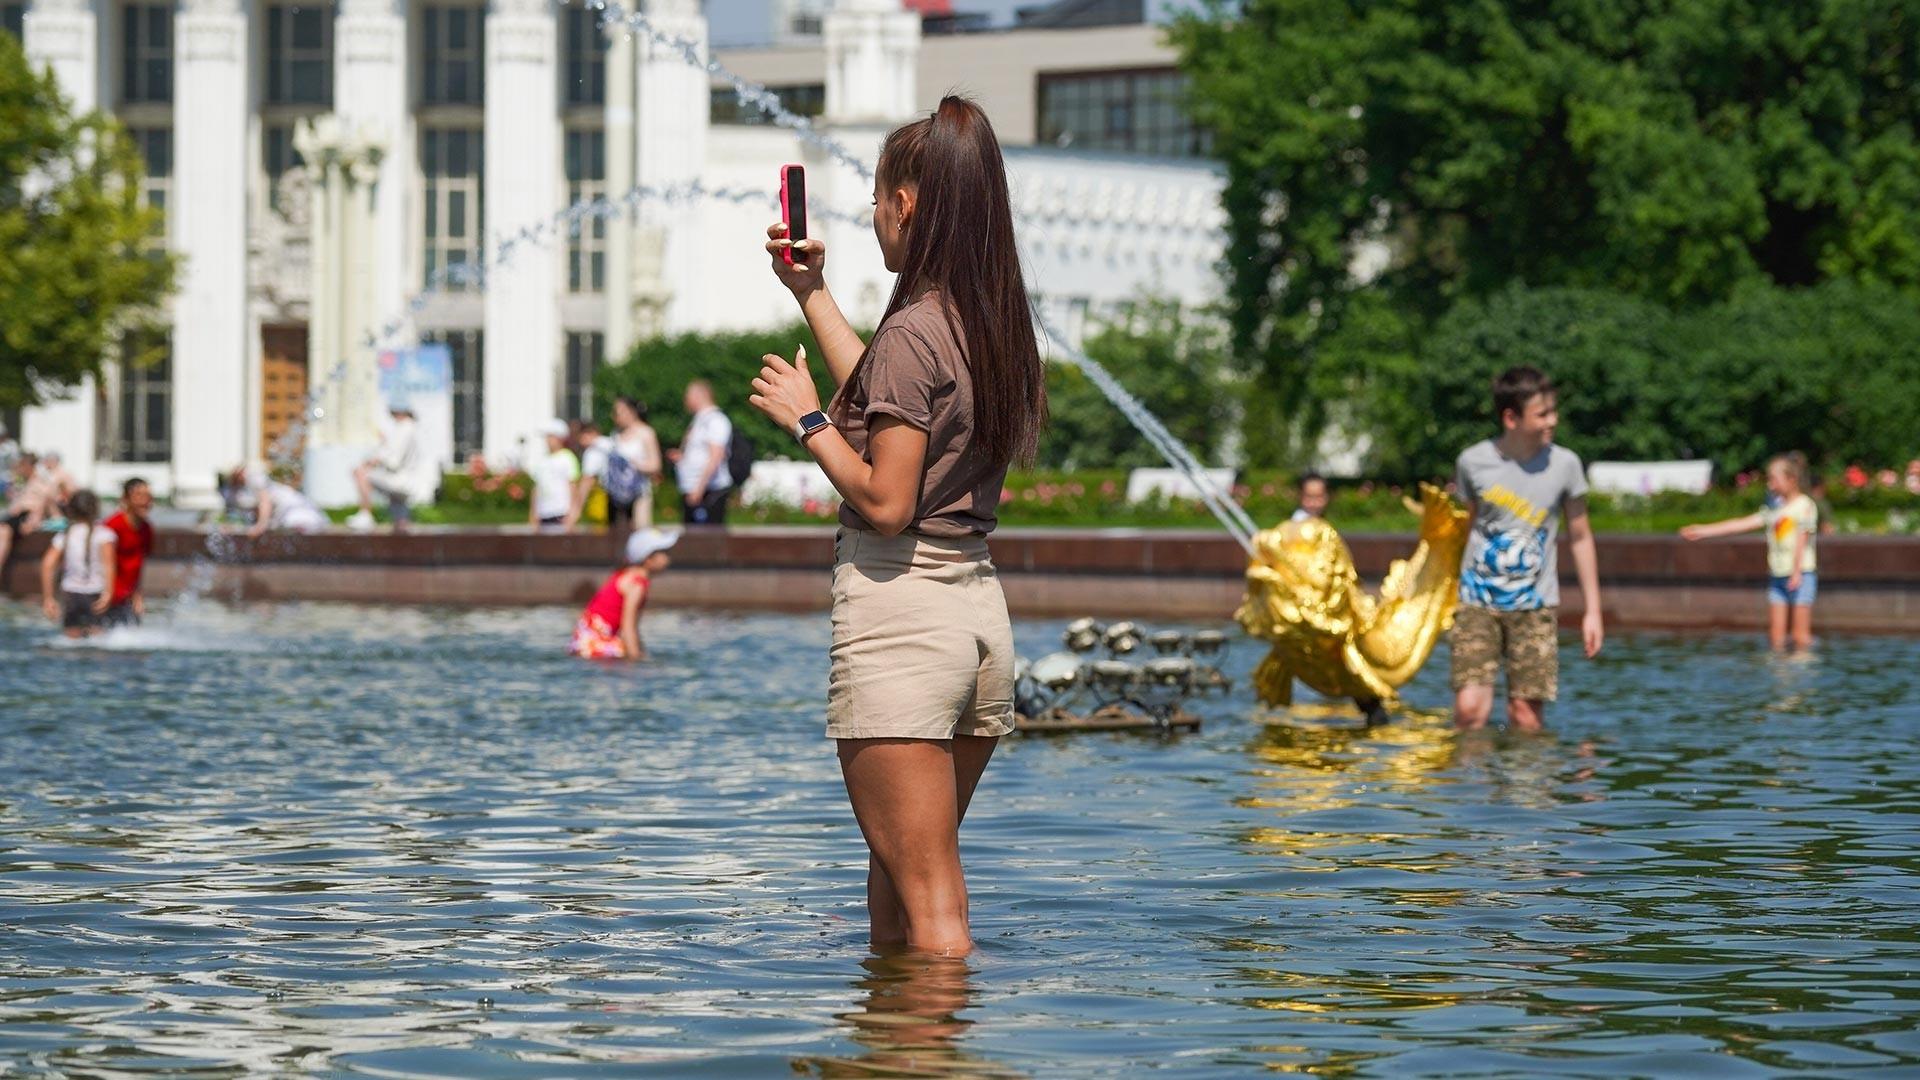 Московскиот парк ВДНХ, 22 јуни 2021 г.